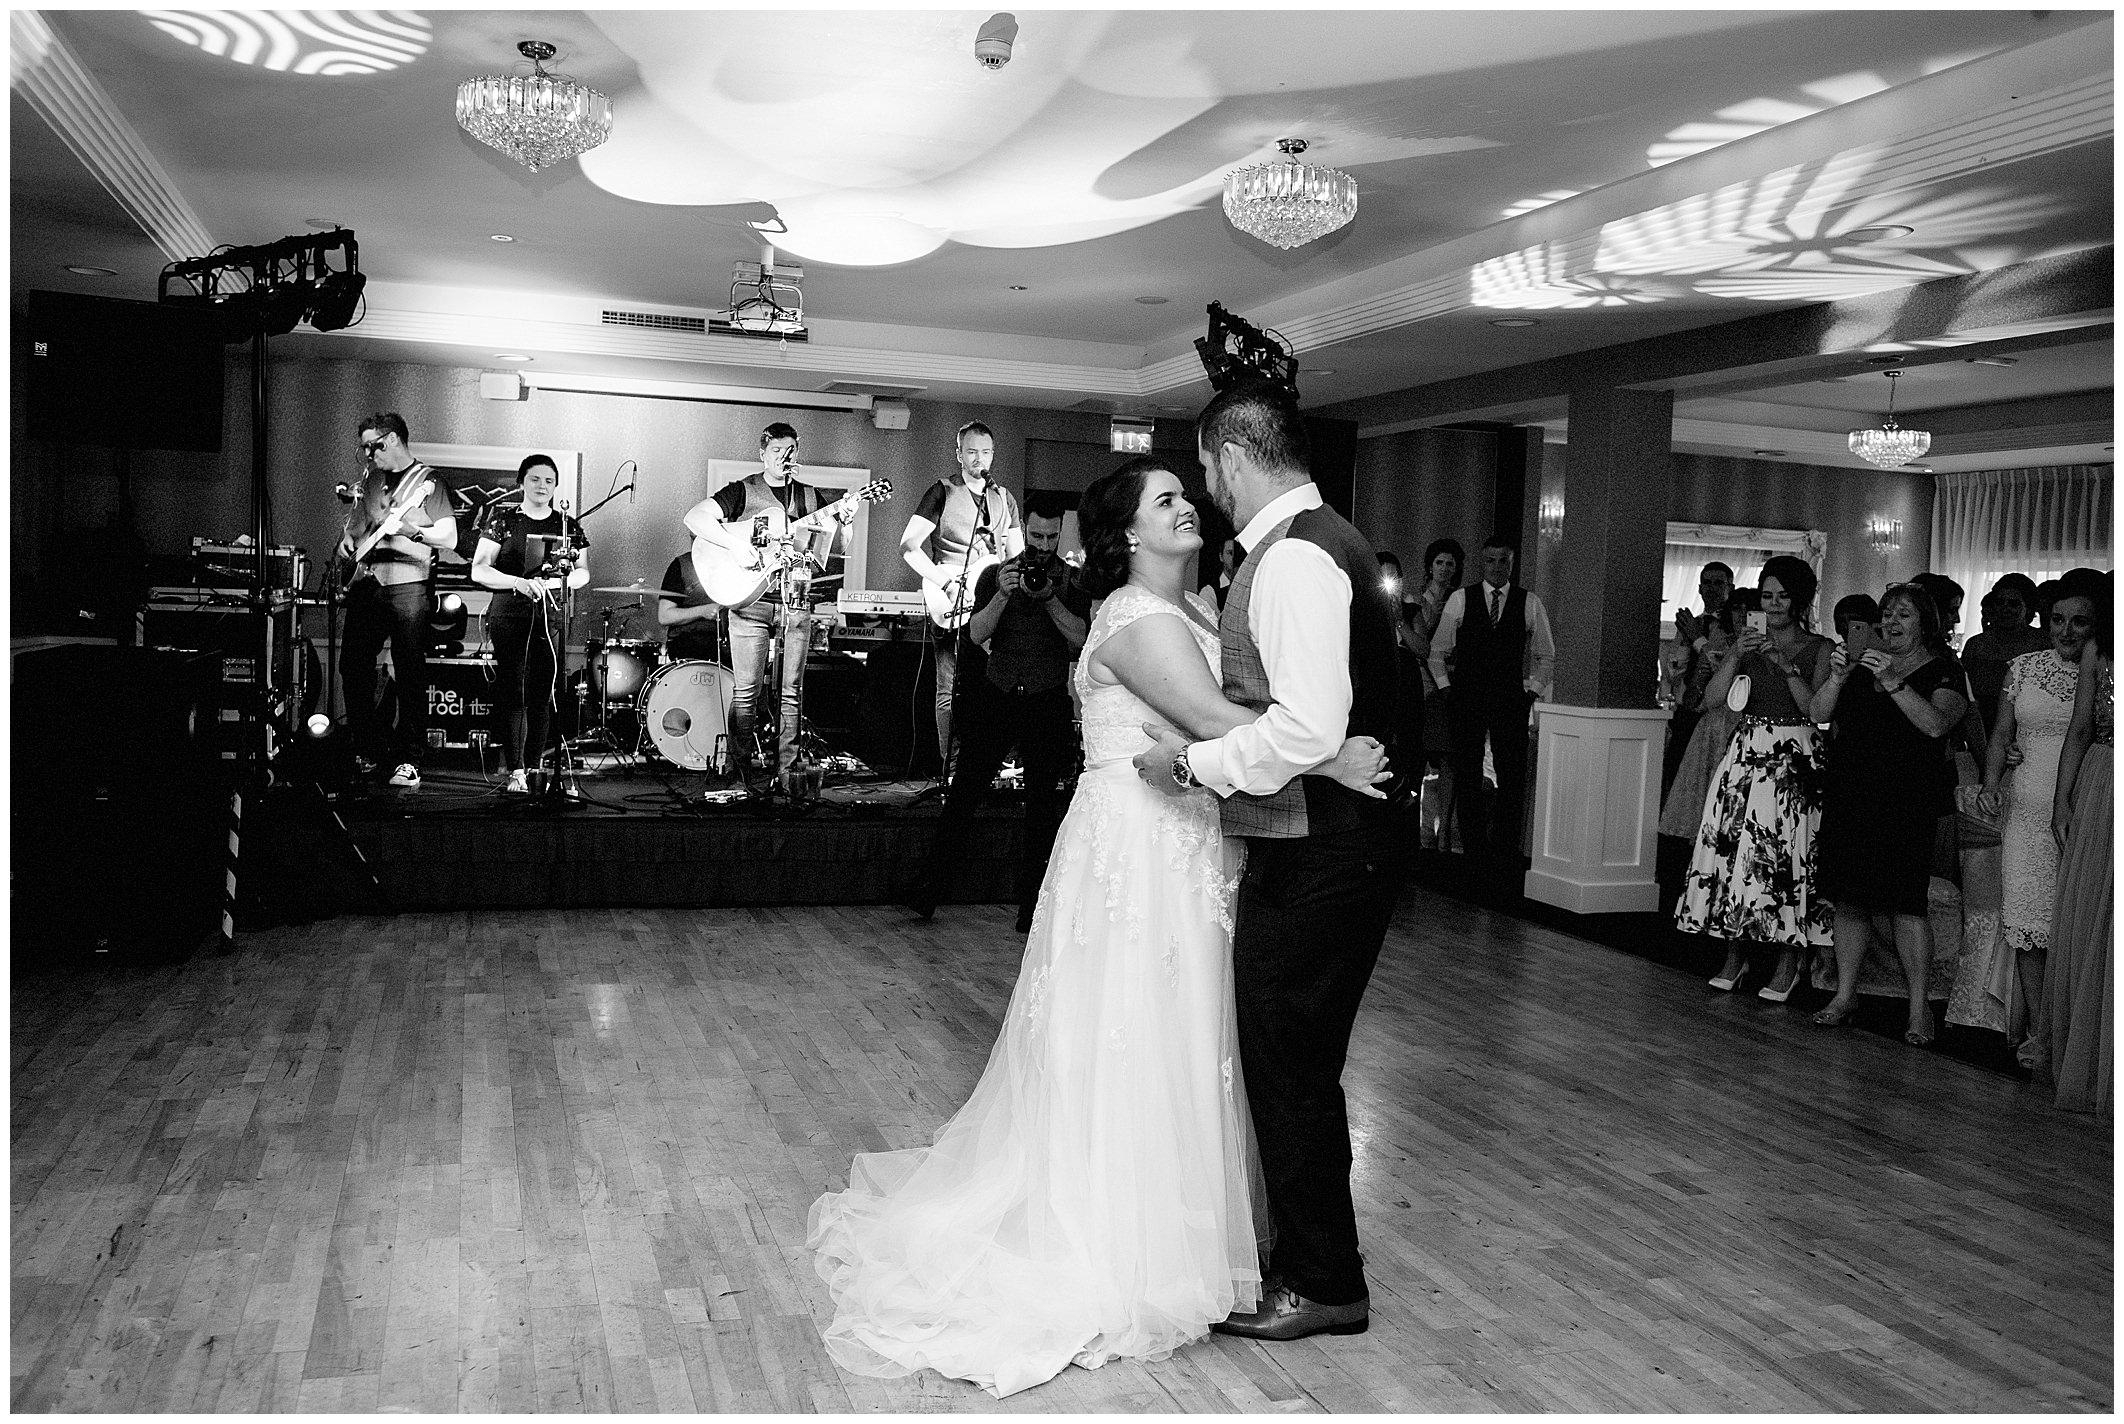 redcastle-hotel-wedding-karen-brian-jude-browne-photography-140.jpg